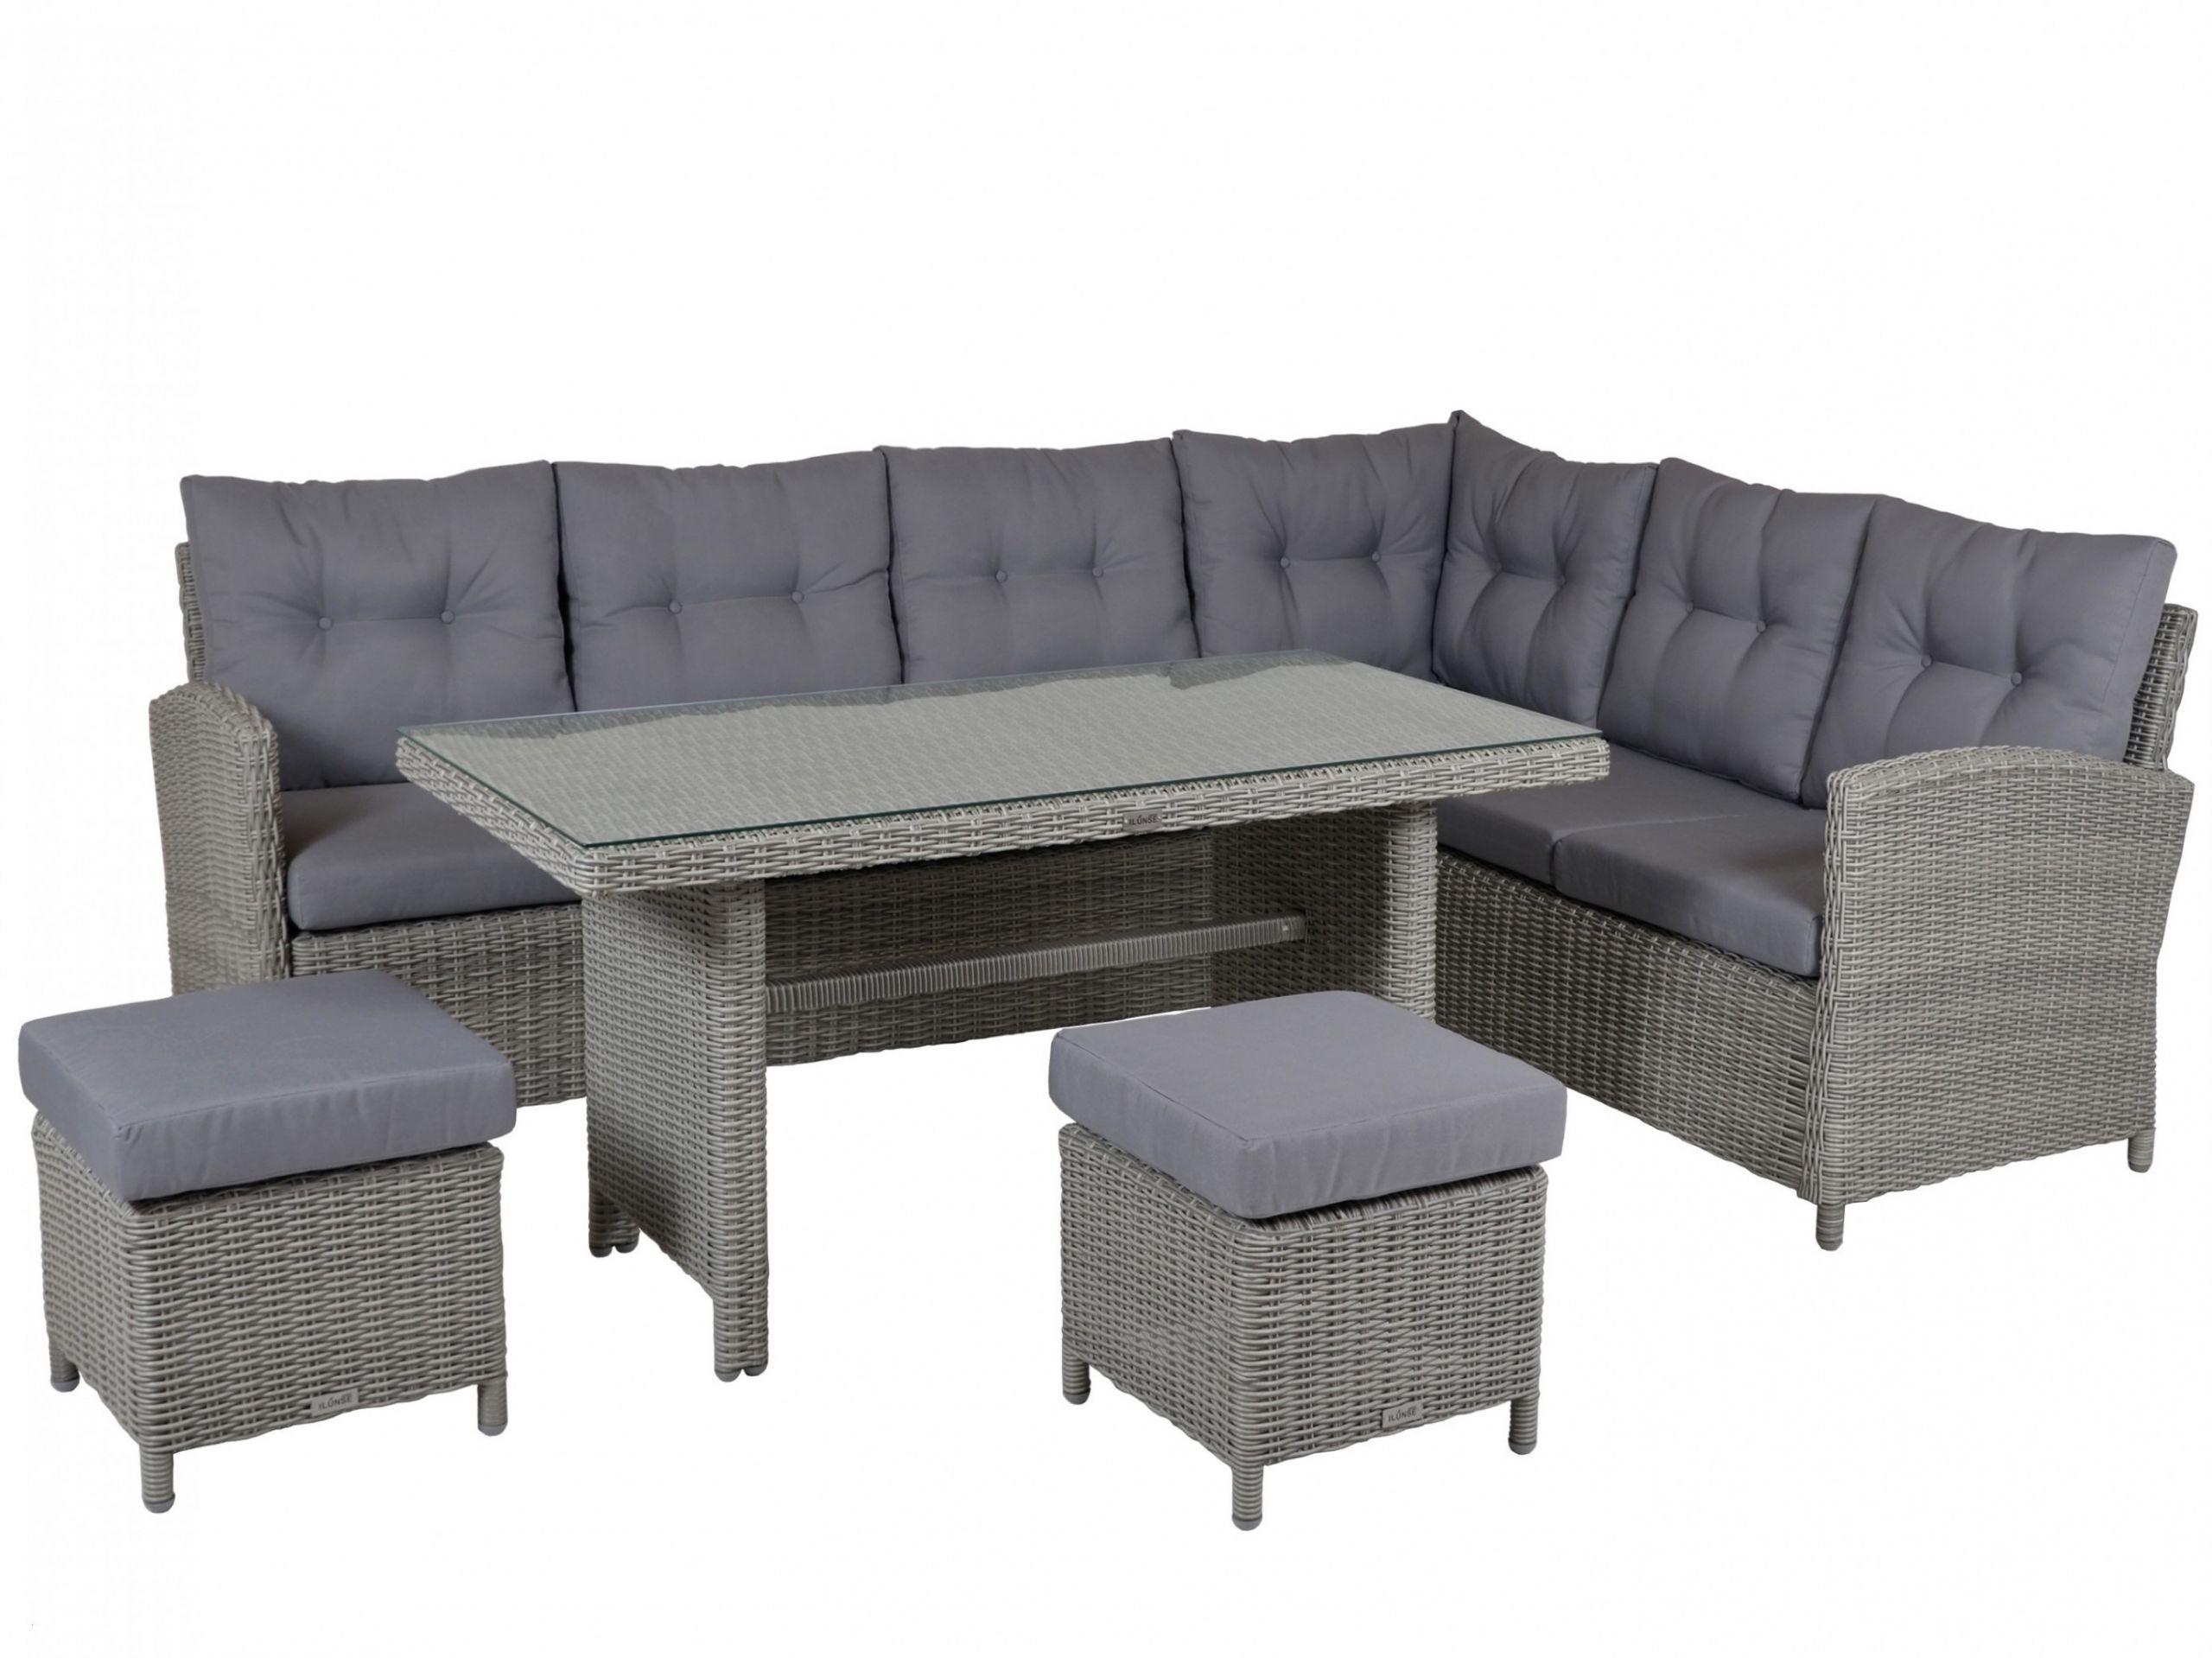 loungemobel garten grau moderne garten lounge awesome terrasse sofa awesome bequeme sofa 0d of loungemobel garten grau 1